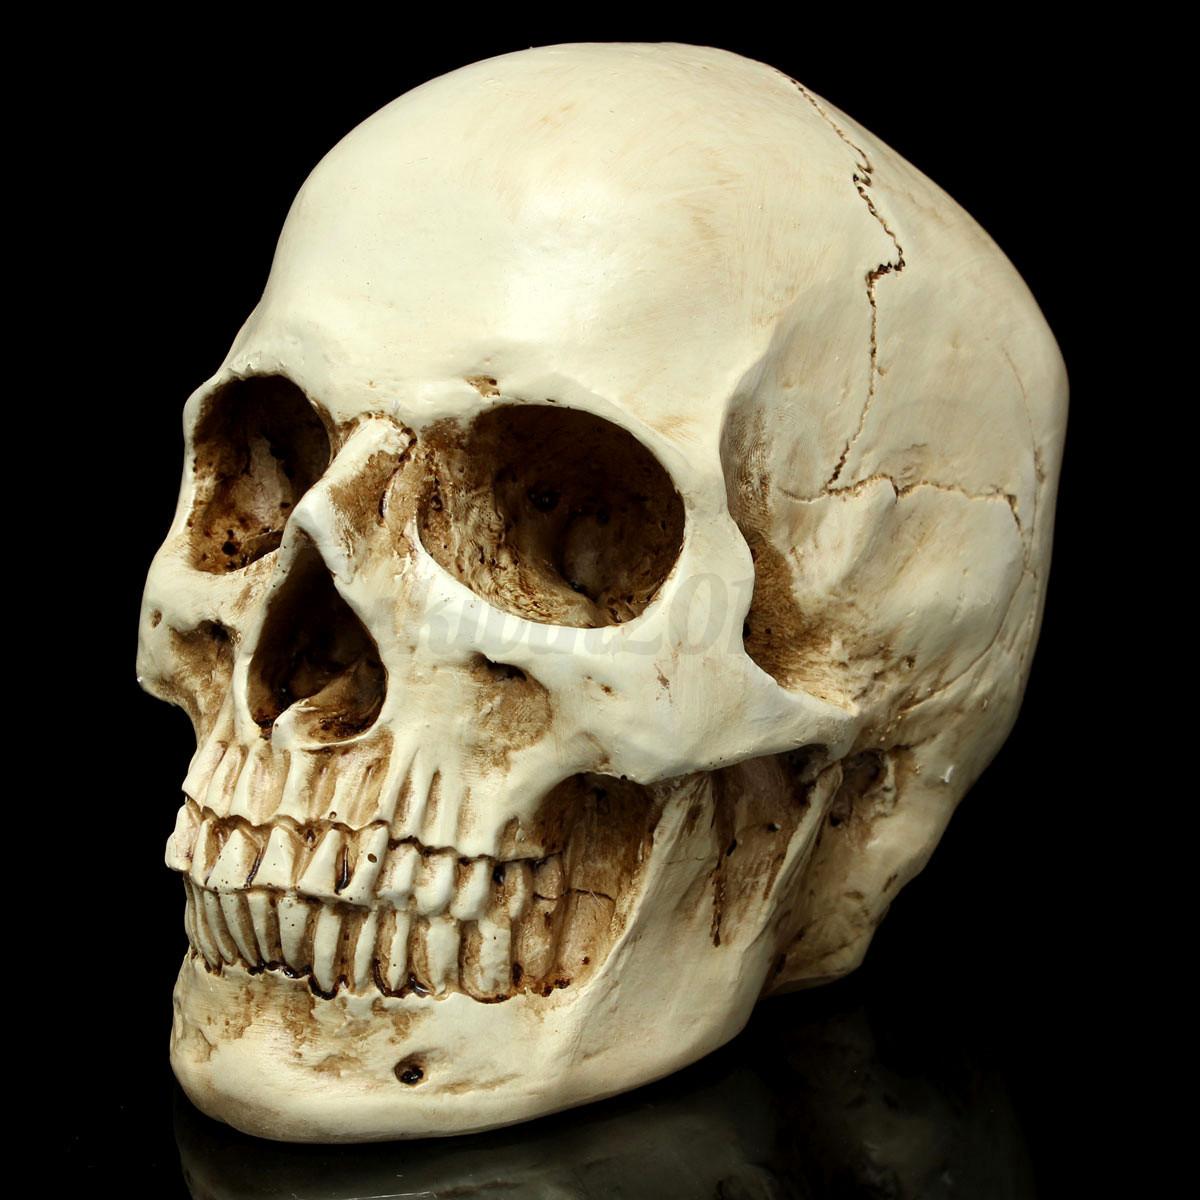 Lifesize 1:1 Resin Replica Real Life Human Anatomy Skeleton Skull ...